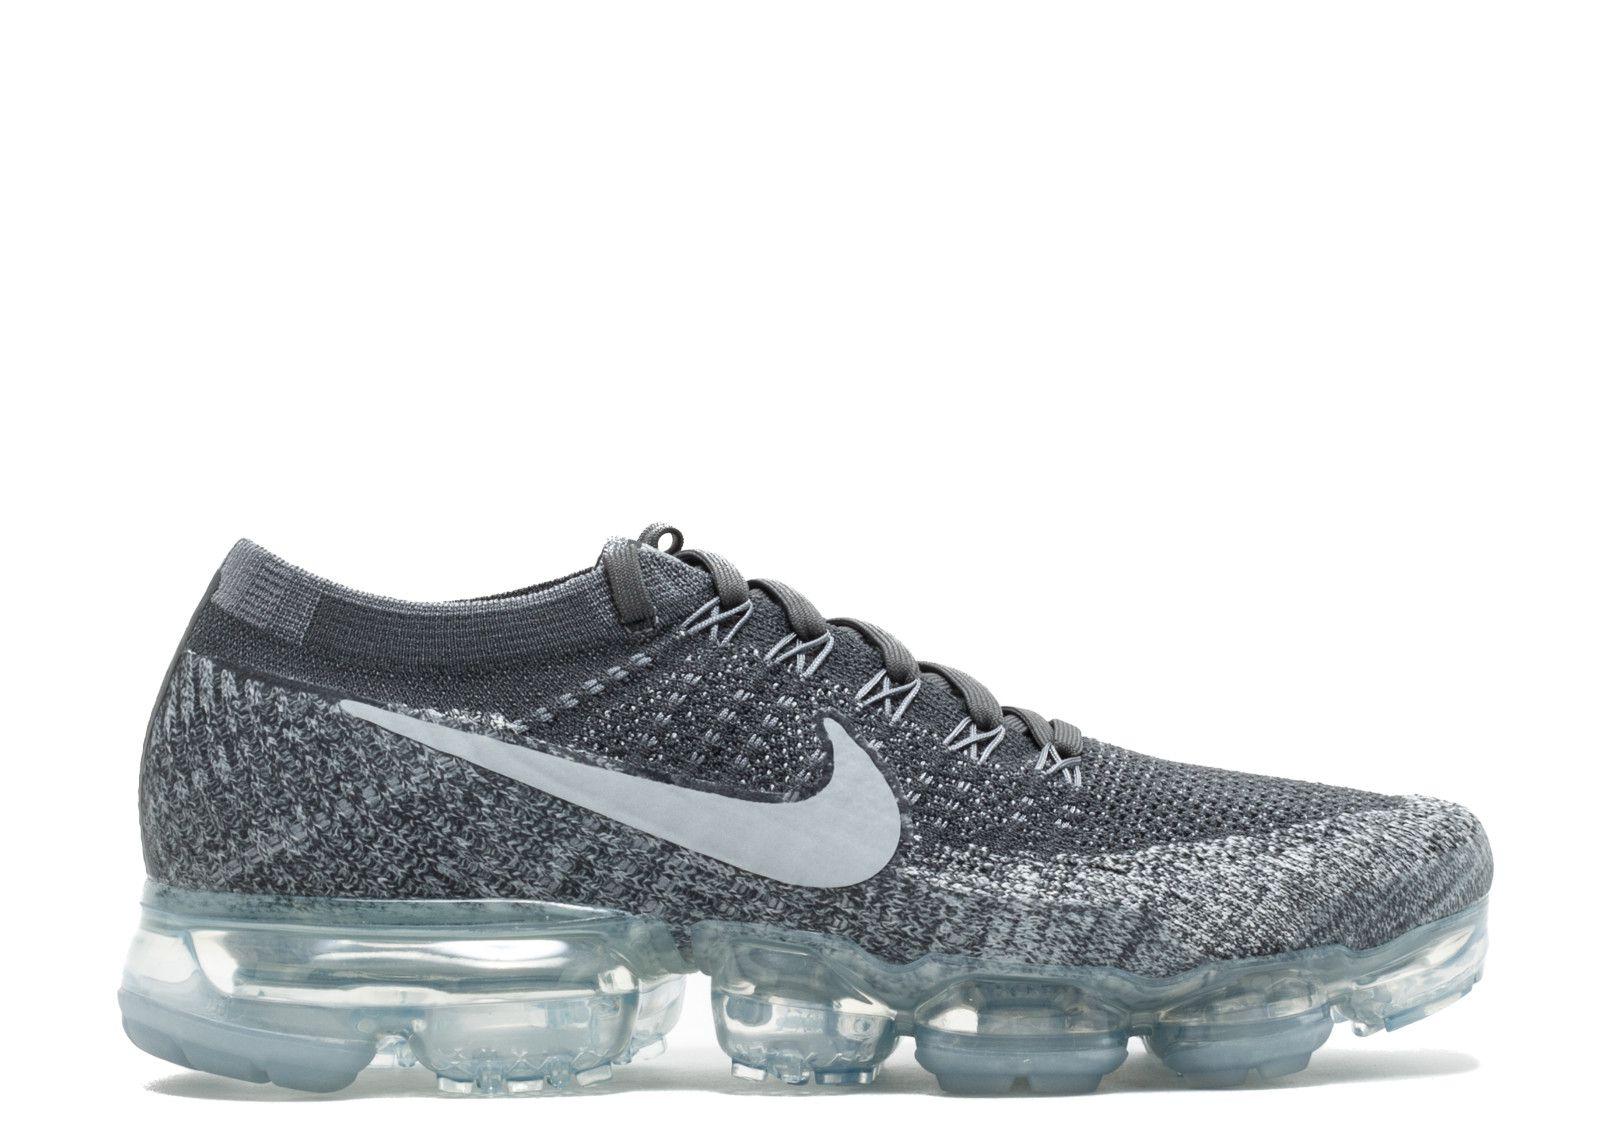 Nike Airmax2018 Gray Running Shoes ...